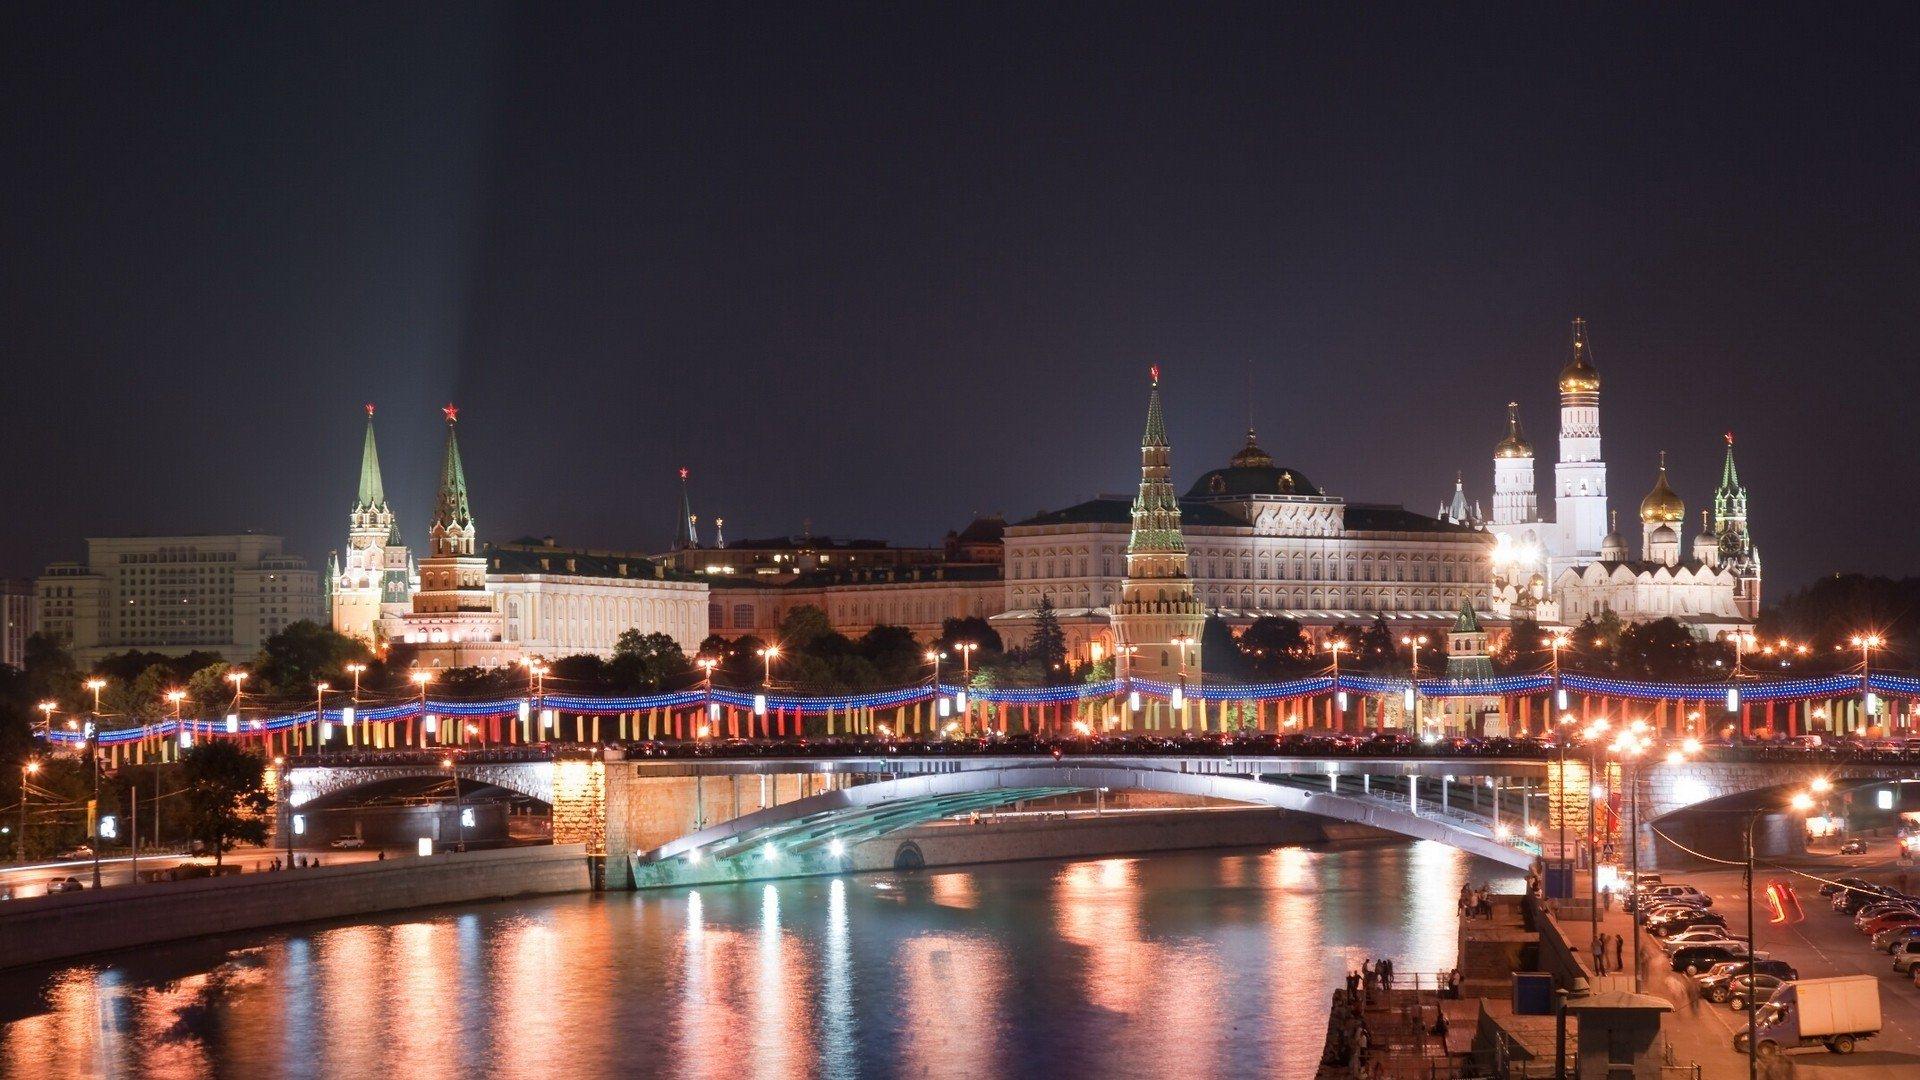 Lights City Wallpaper